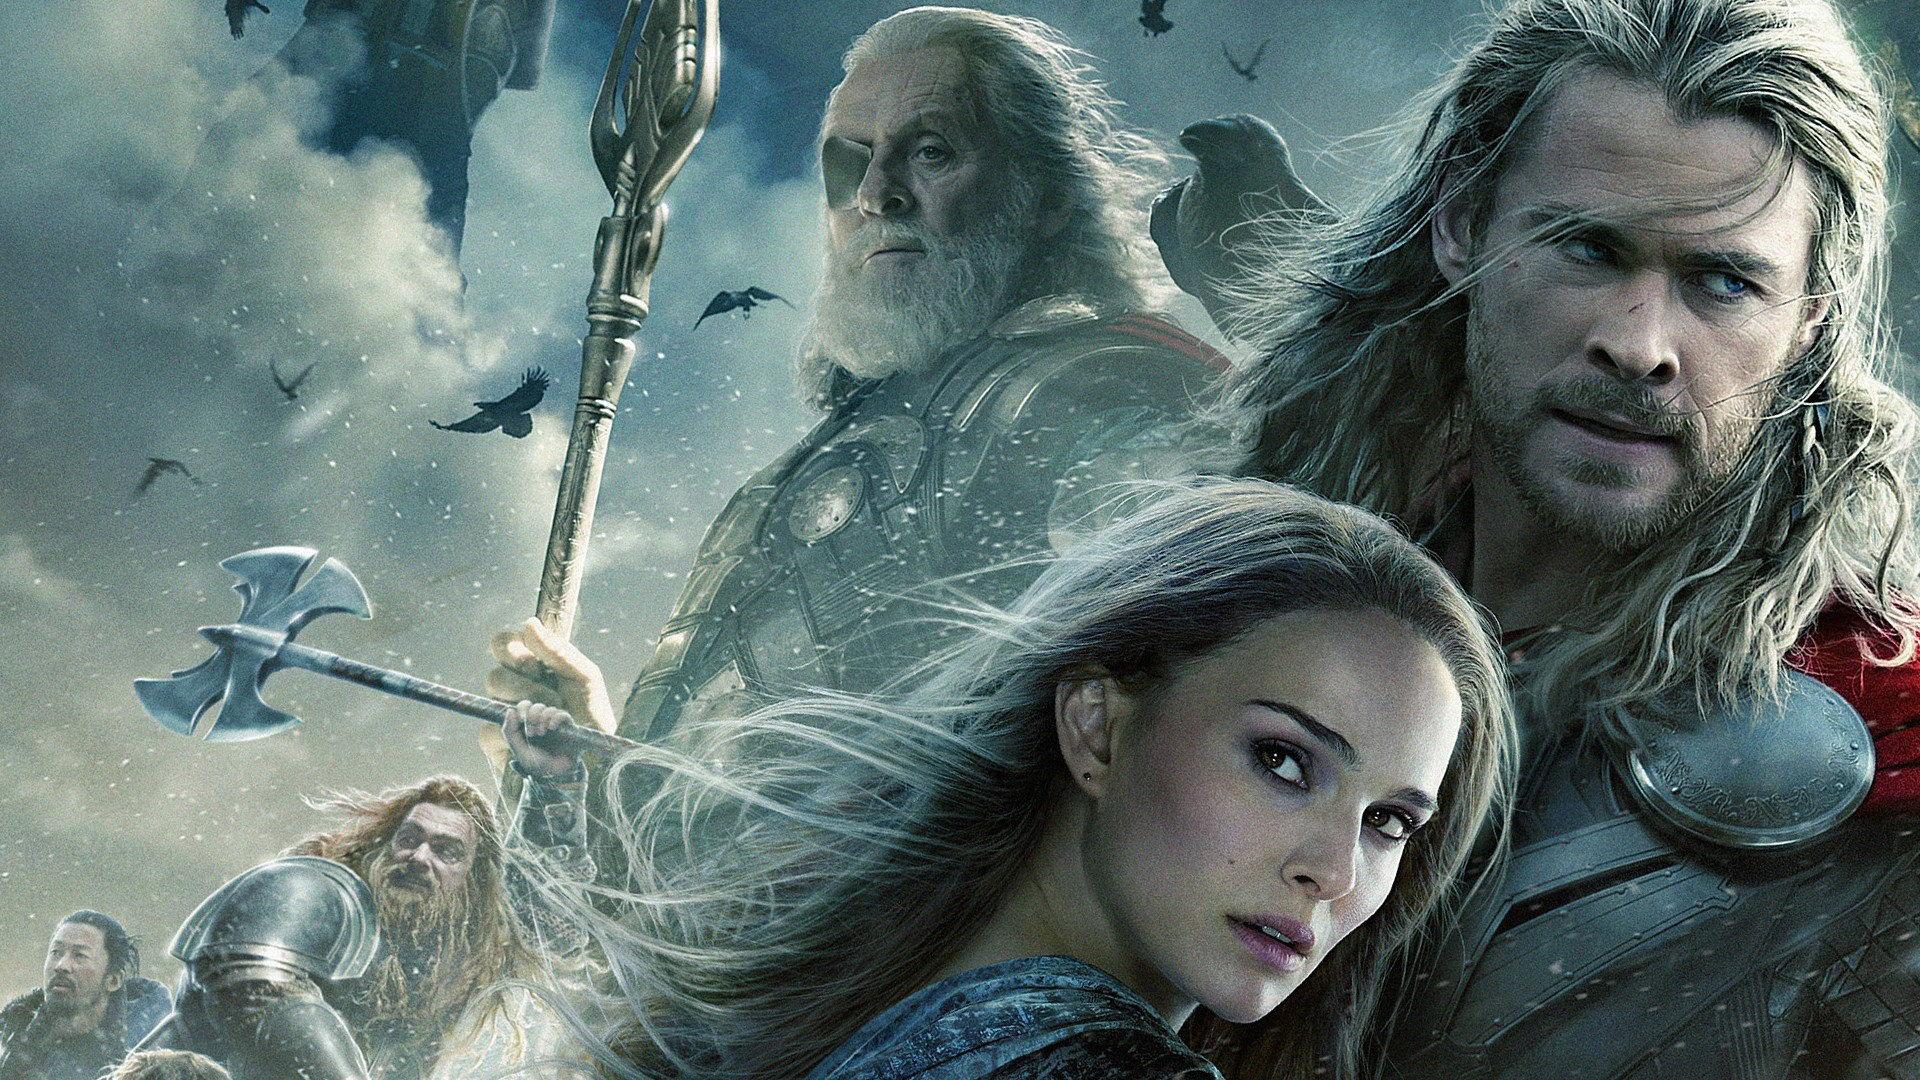 Thor The Dark World wallpaper 1